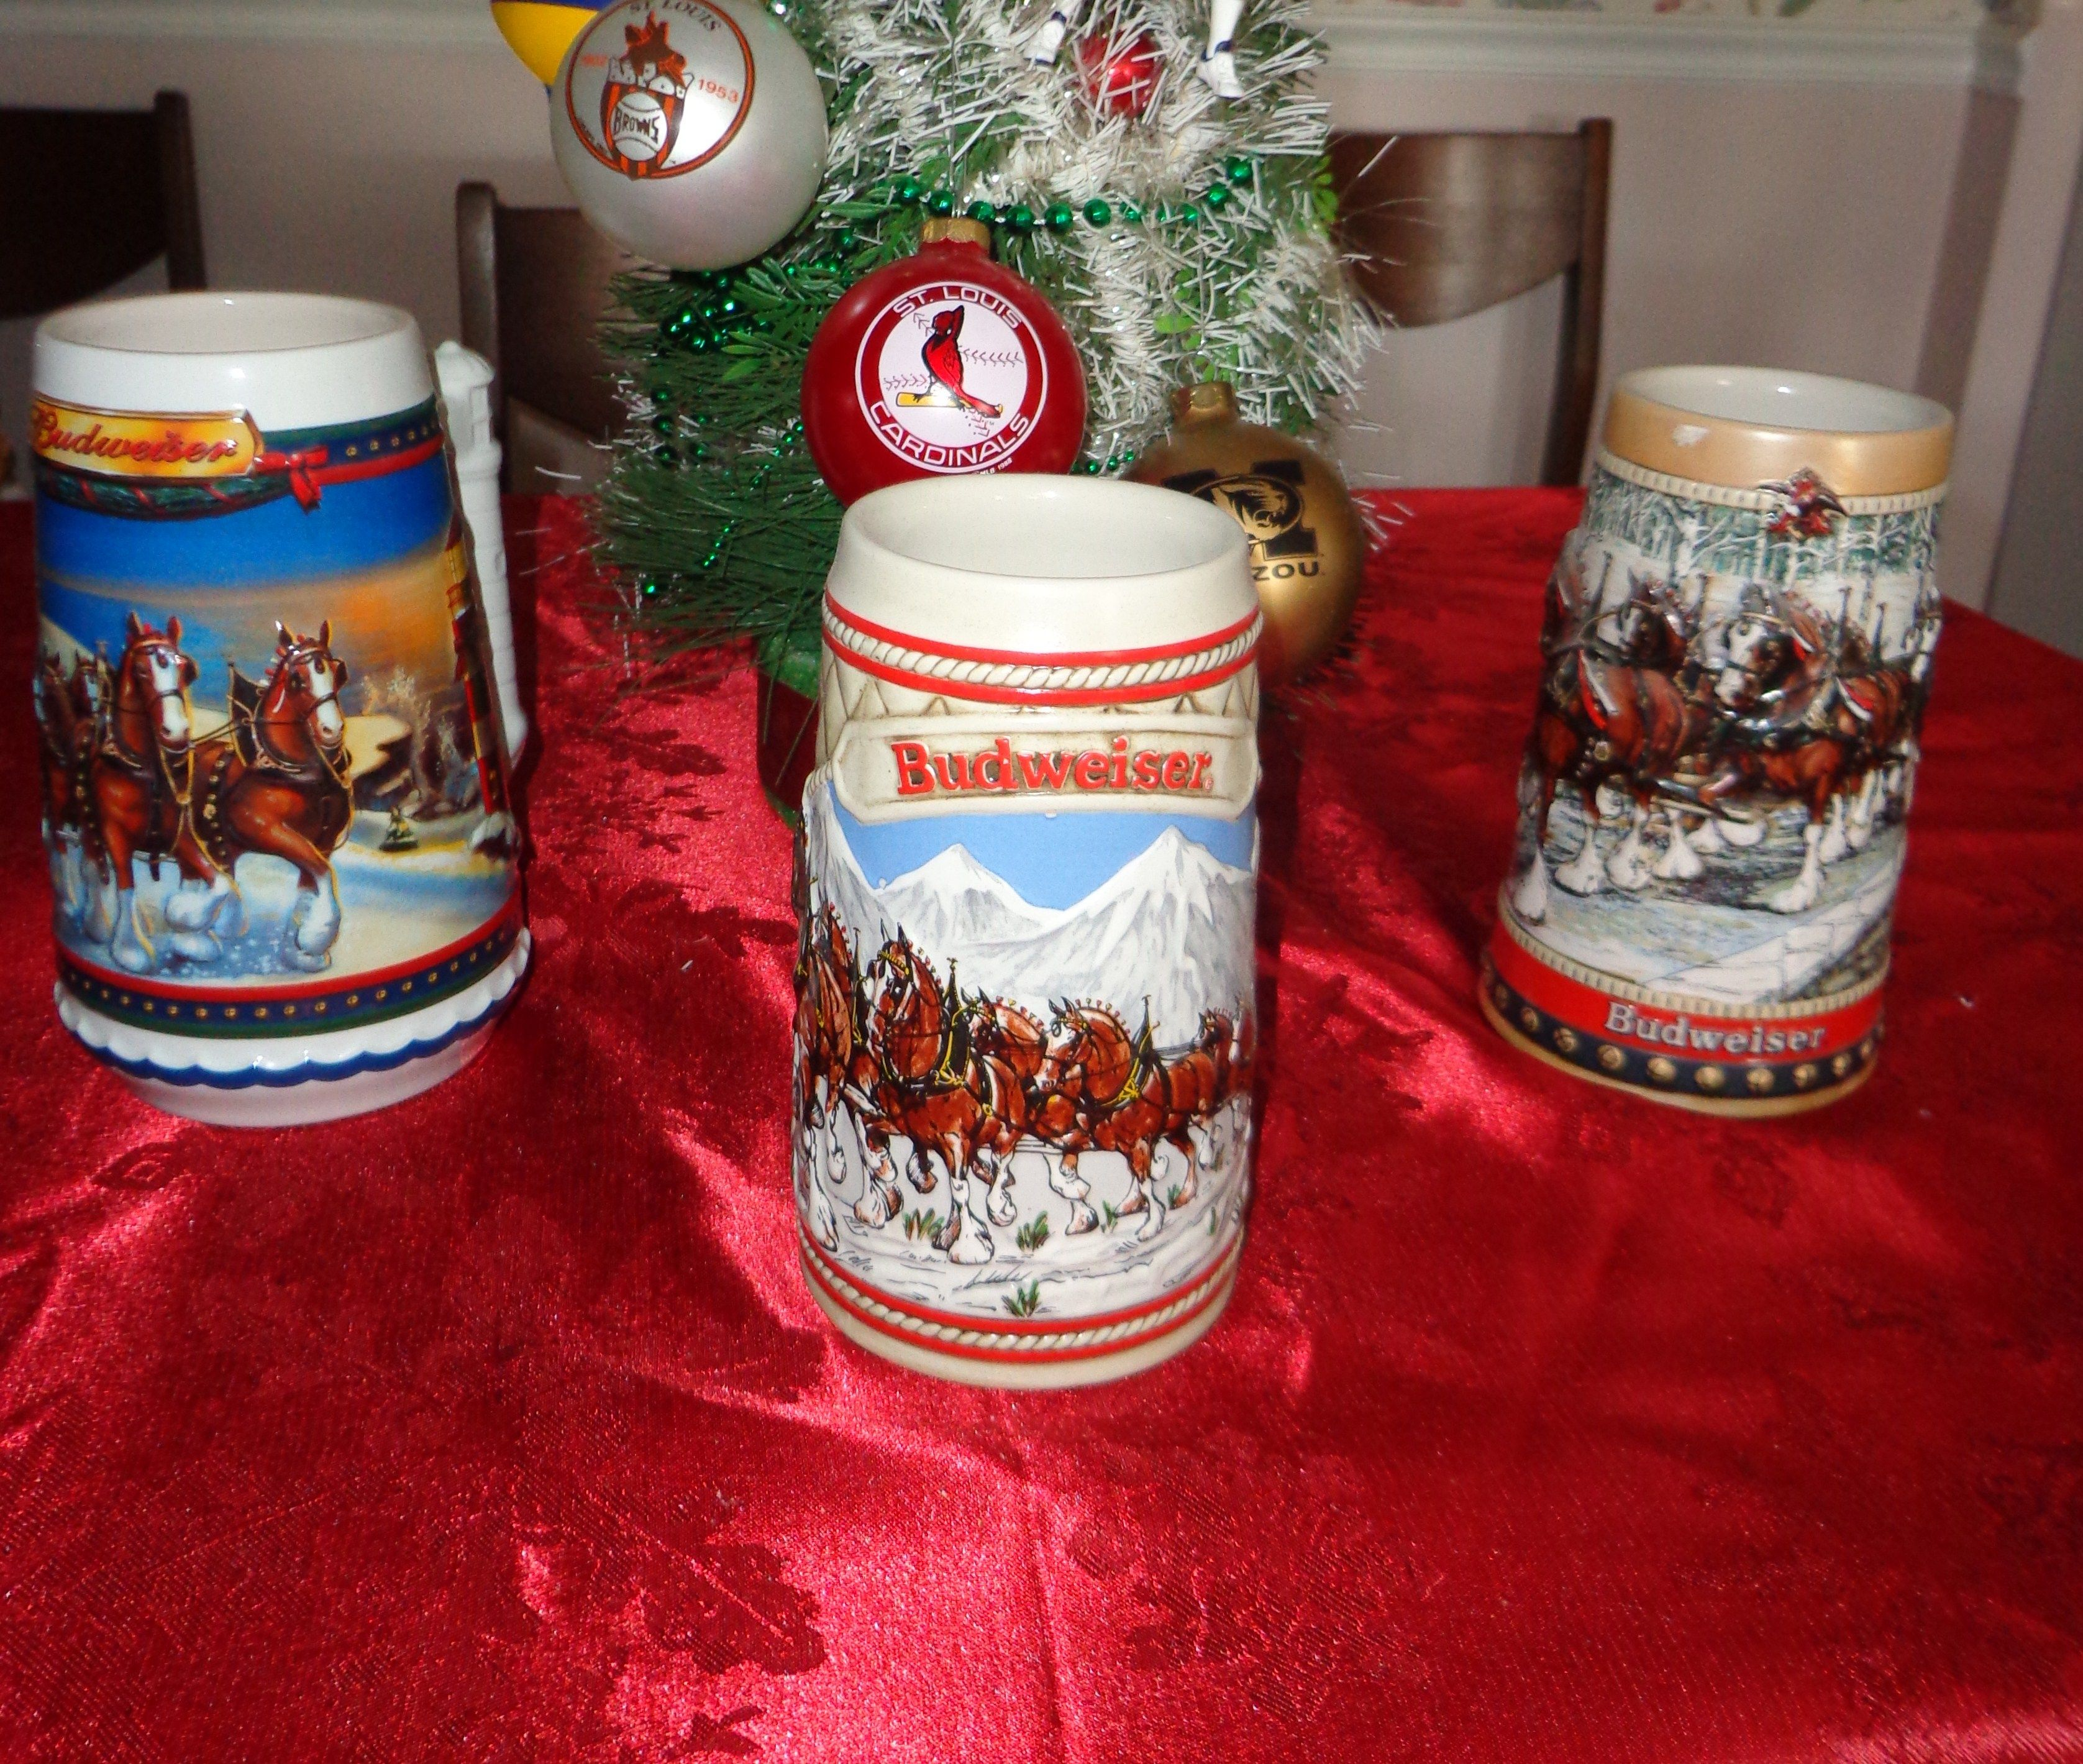 budweiser christmas steins - Budweiser Christmas Steins